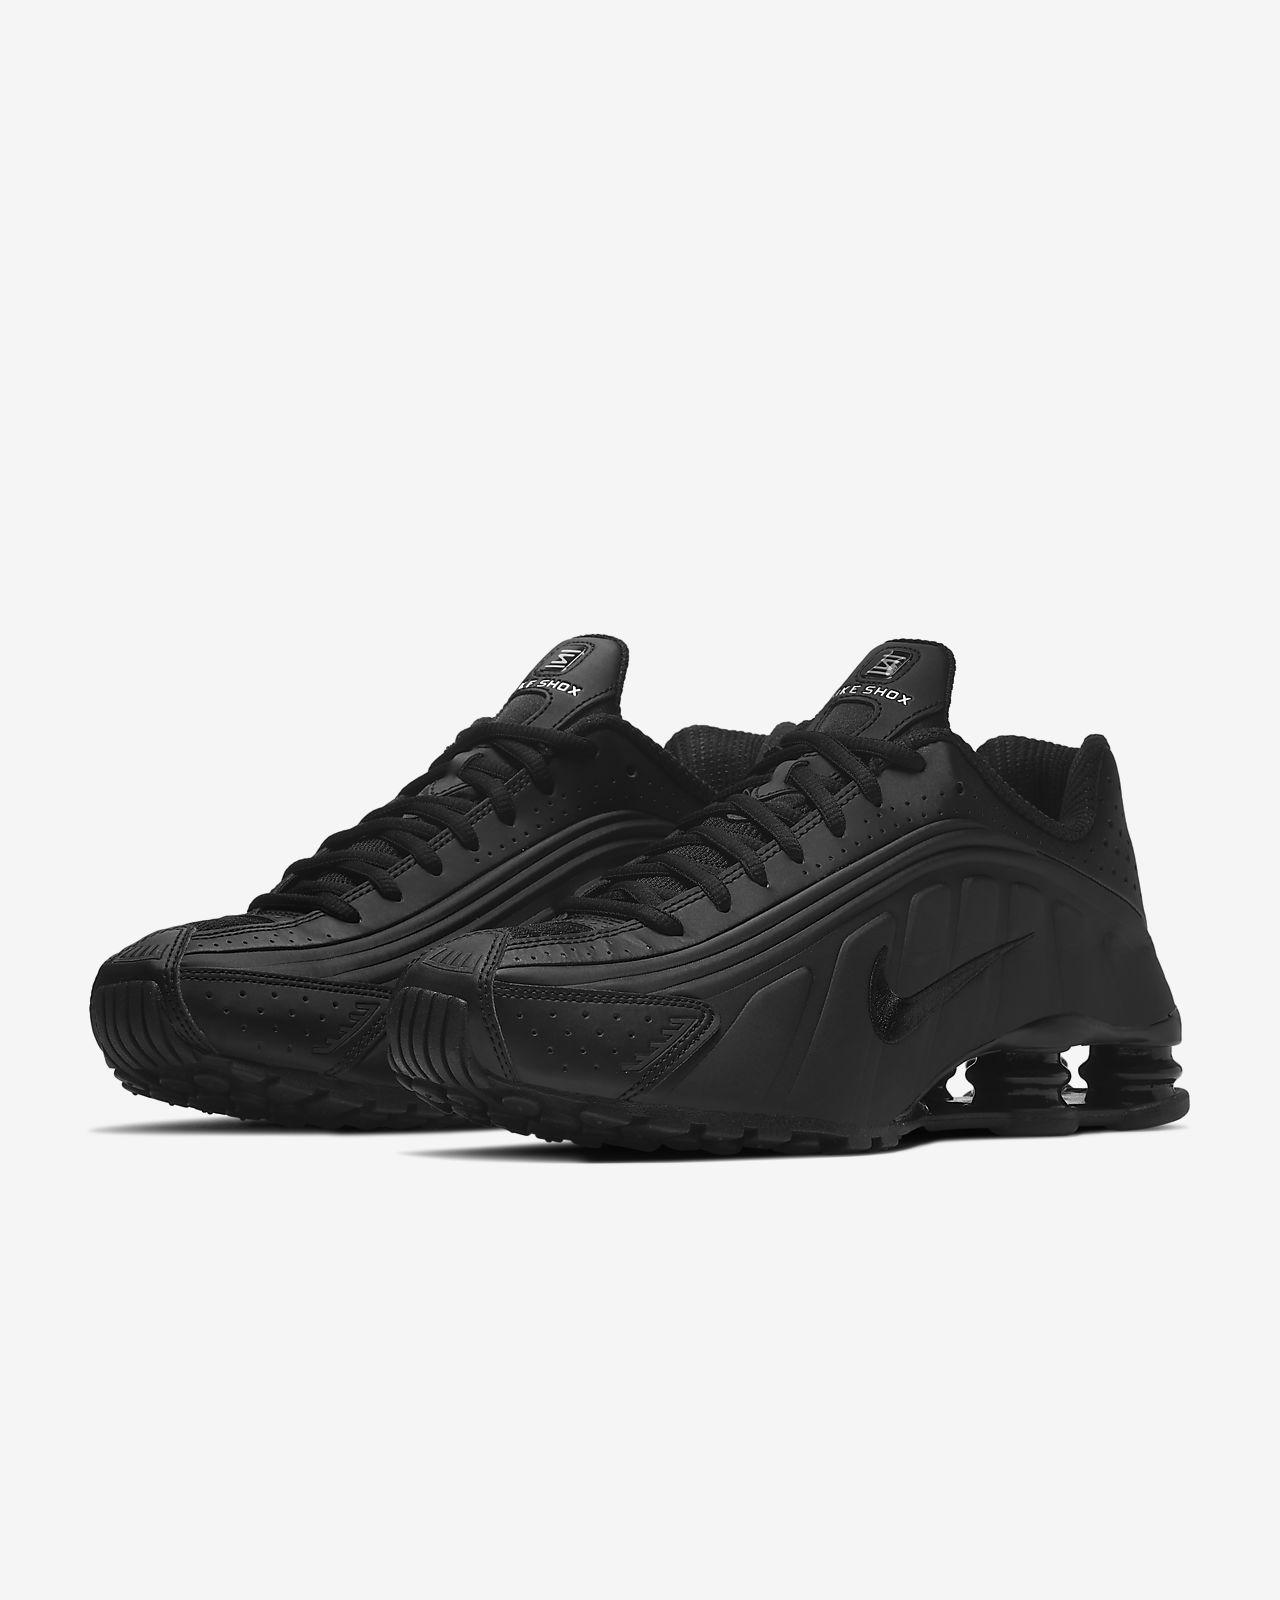 huge discount dcad5 7d950 ... Nike Shox R4 Men s Shoe